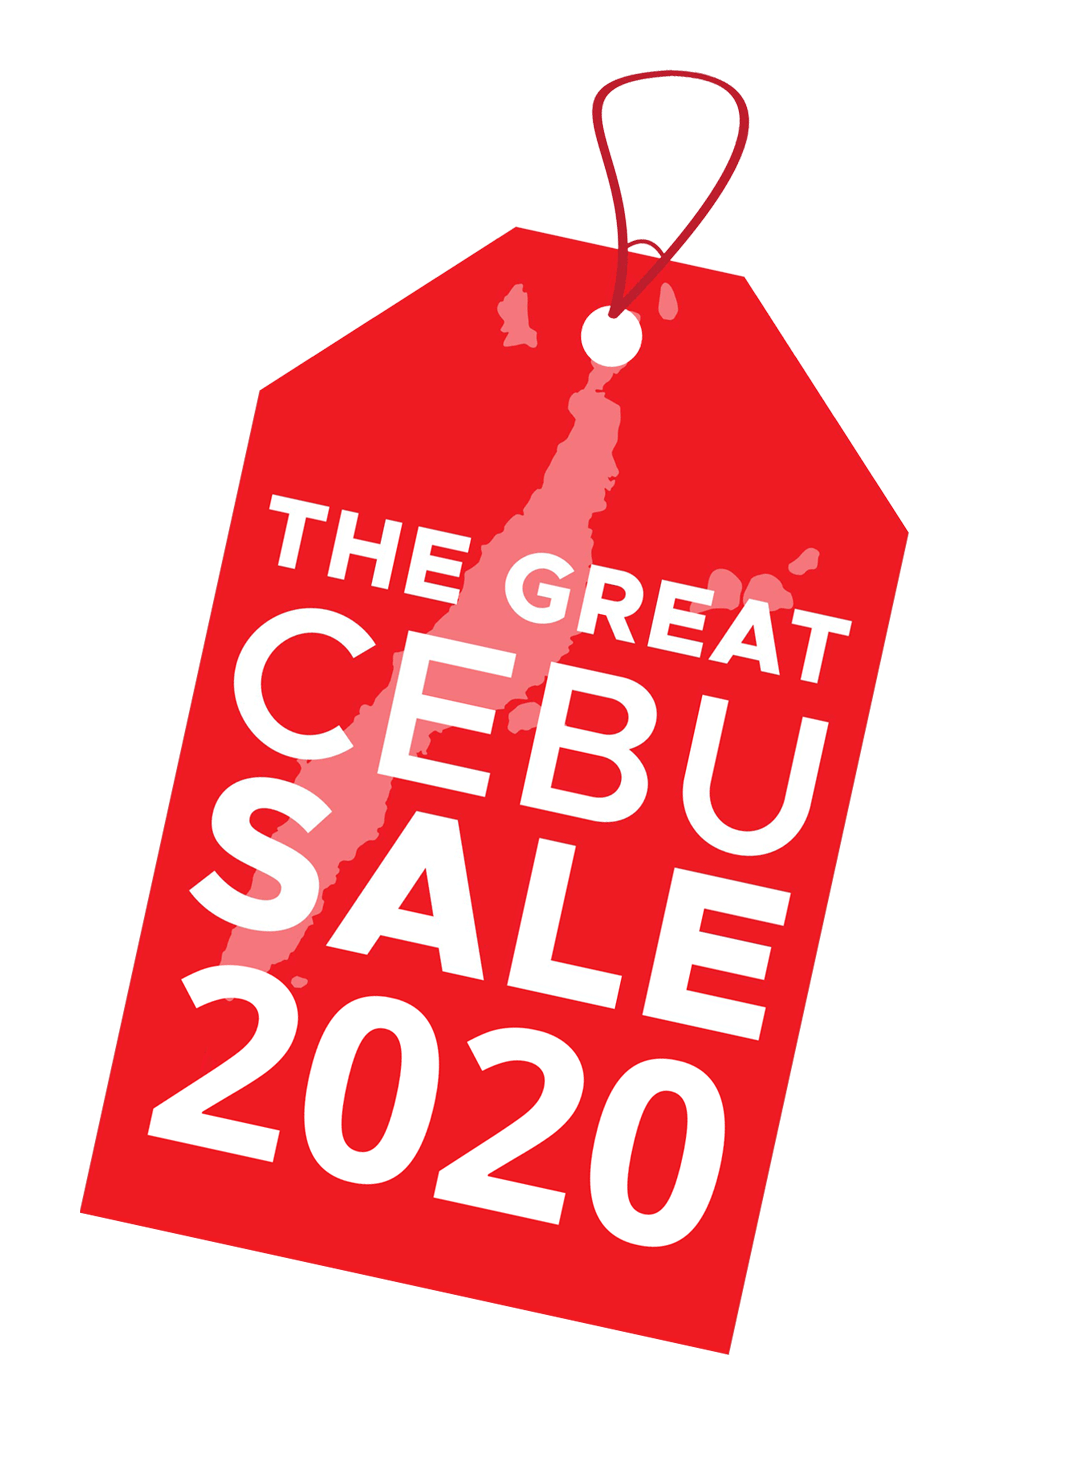 The Great Cebu Sale 2020